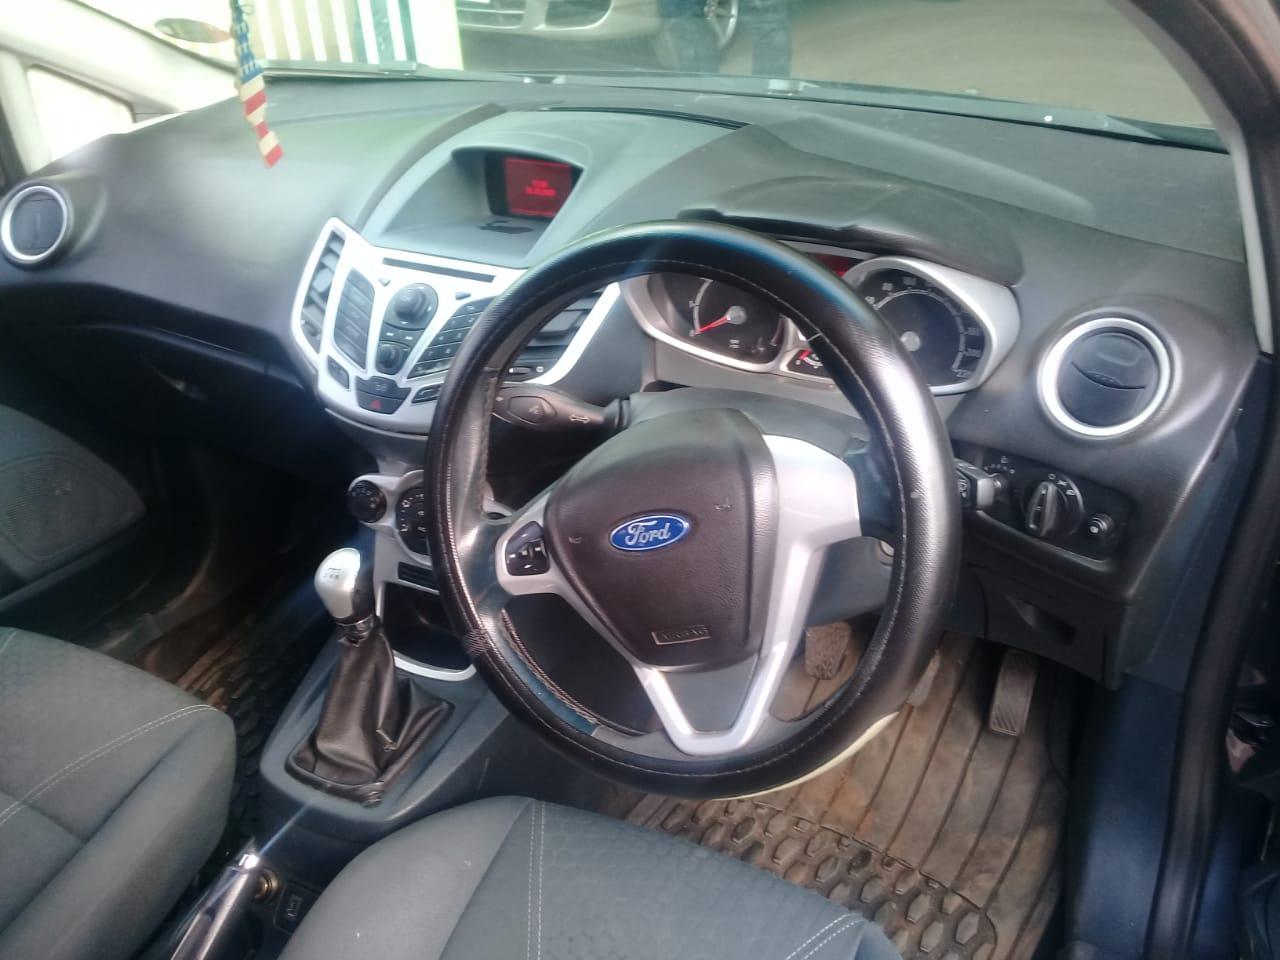 2008 Ford Fiesta 1.4 5 door Ambiente